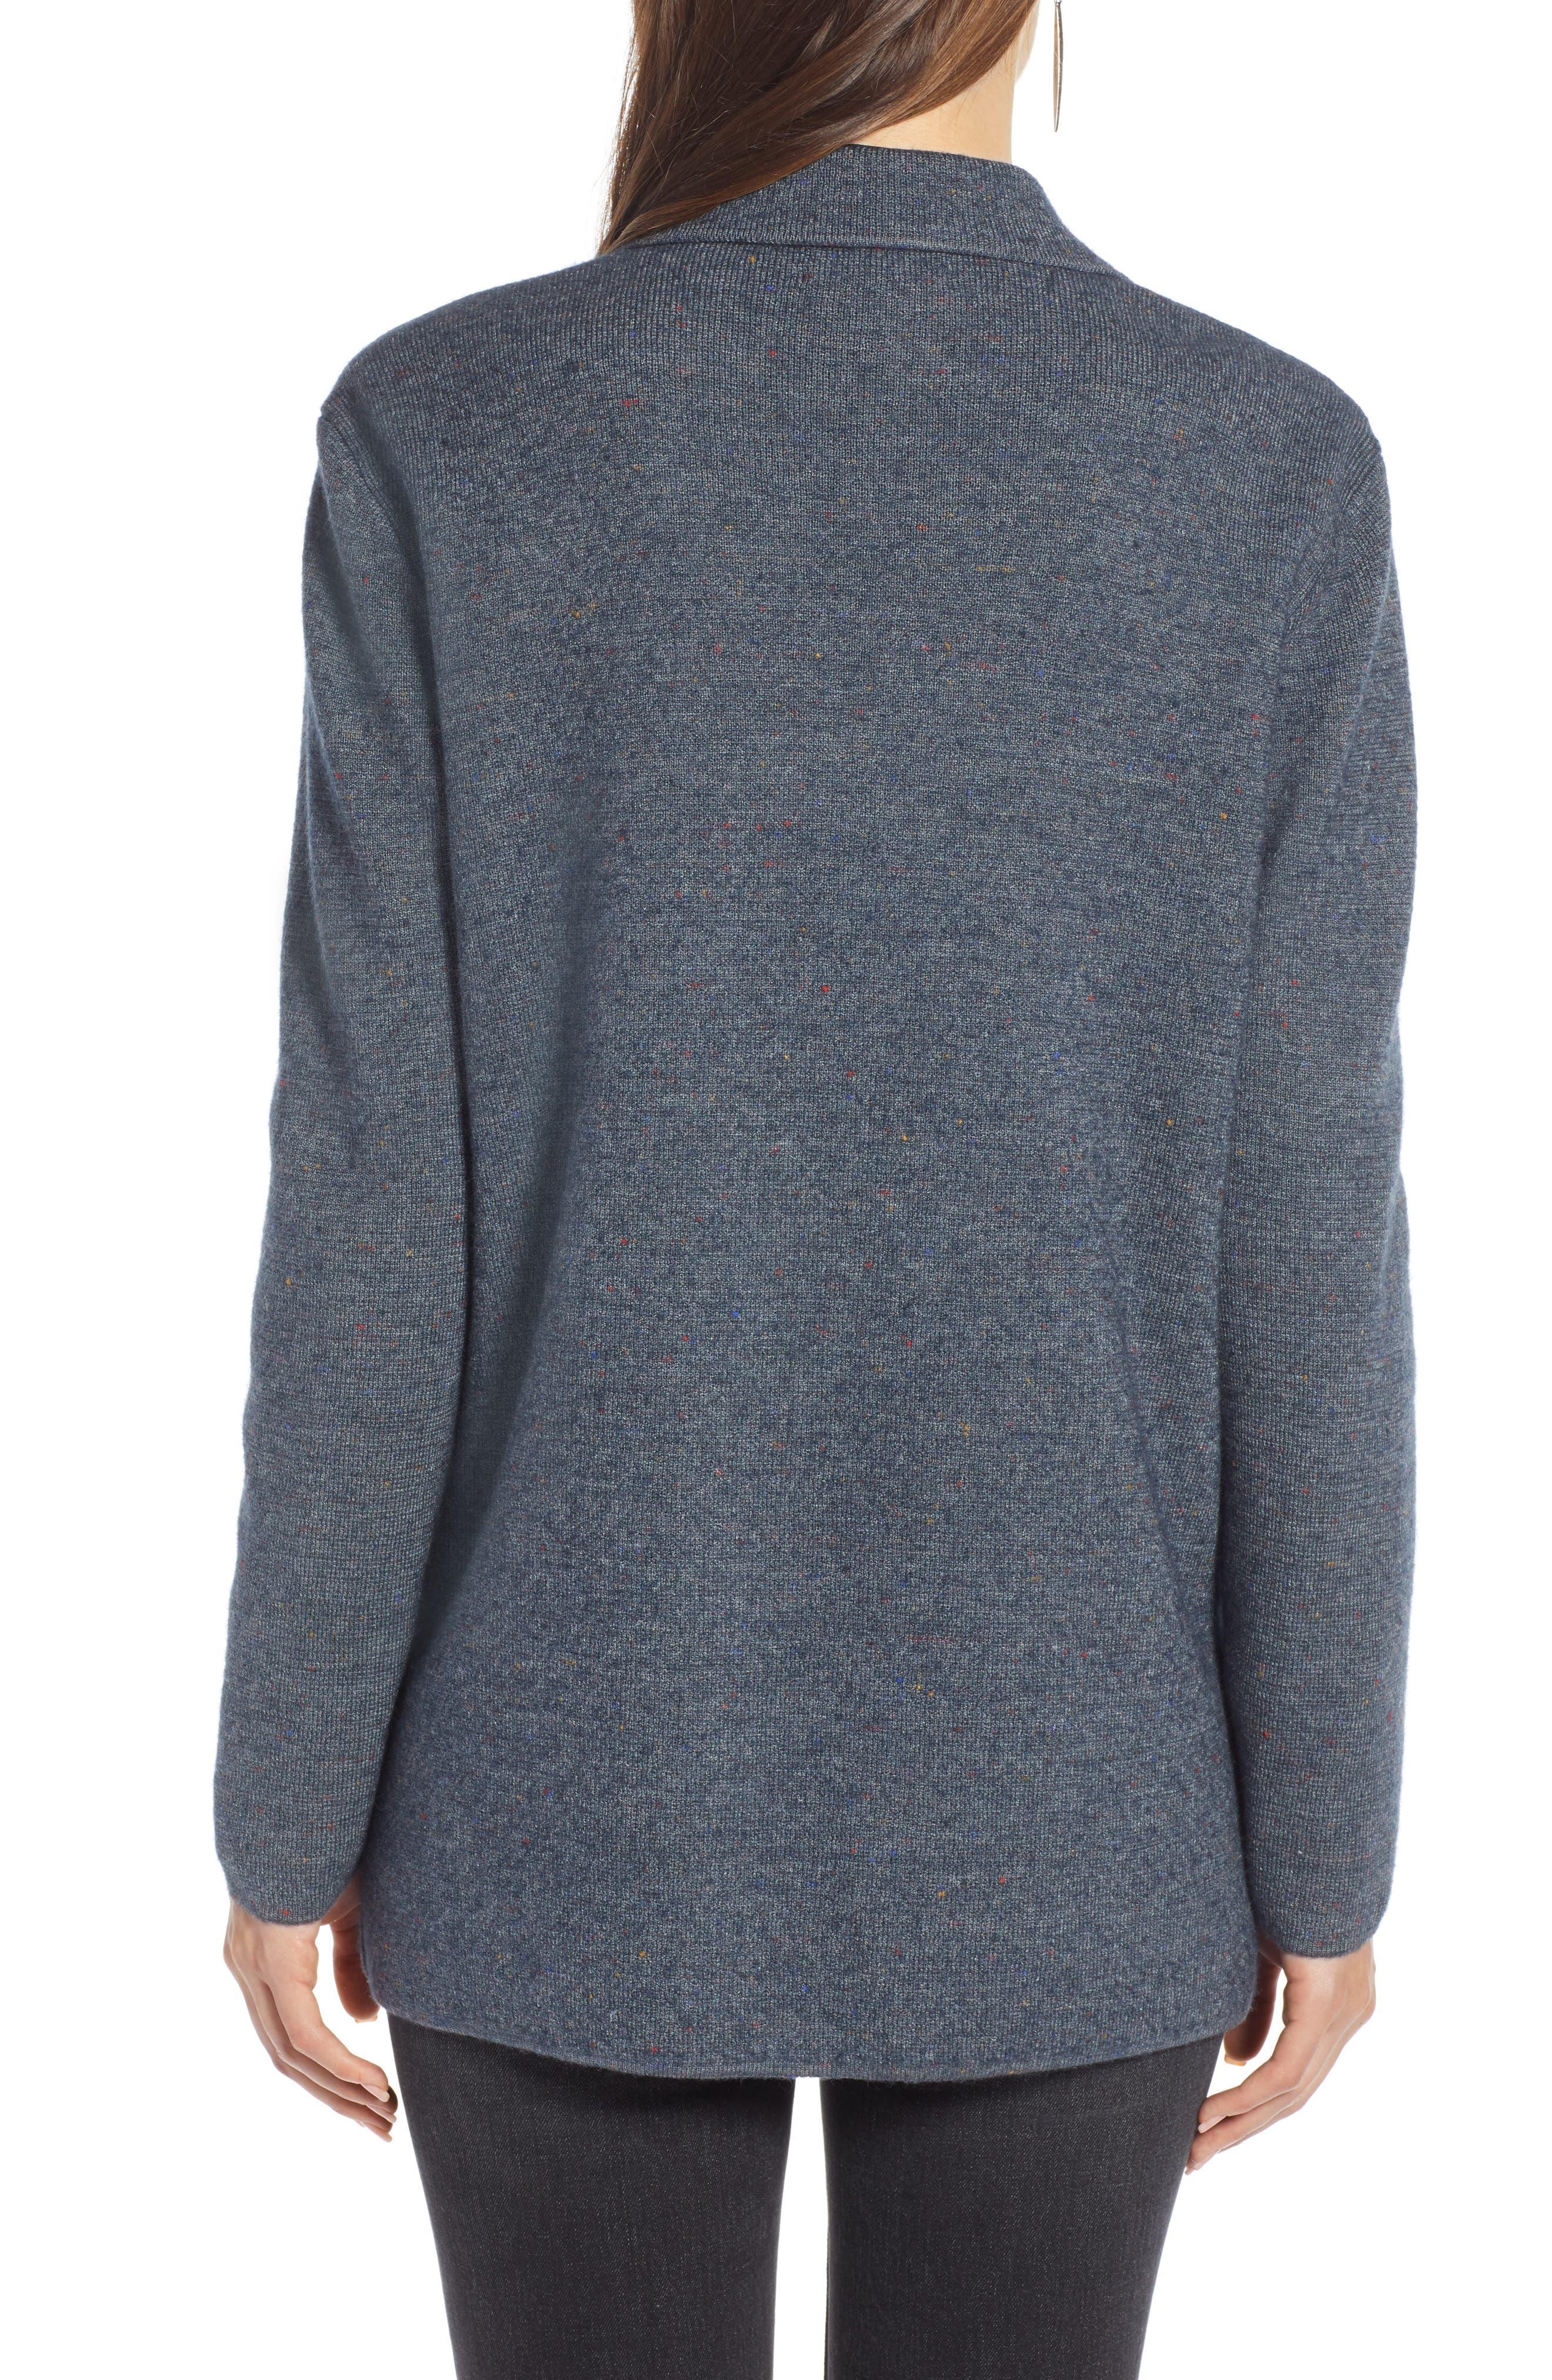 Sweater Blazer,                             Alternate thumbnail 2, color,                             GREY MEDIUM CHARCOAL HEATHER